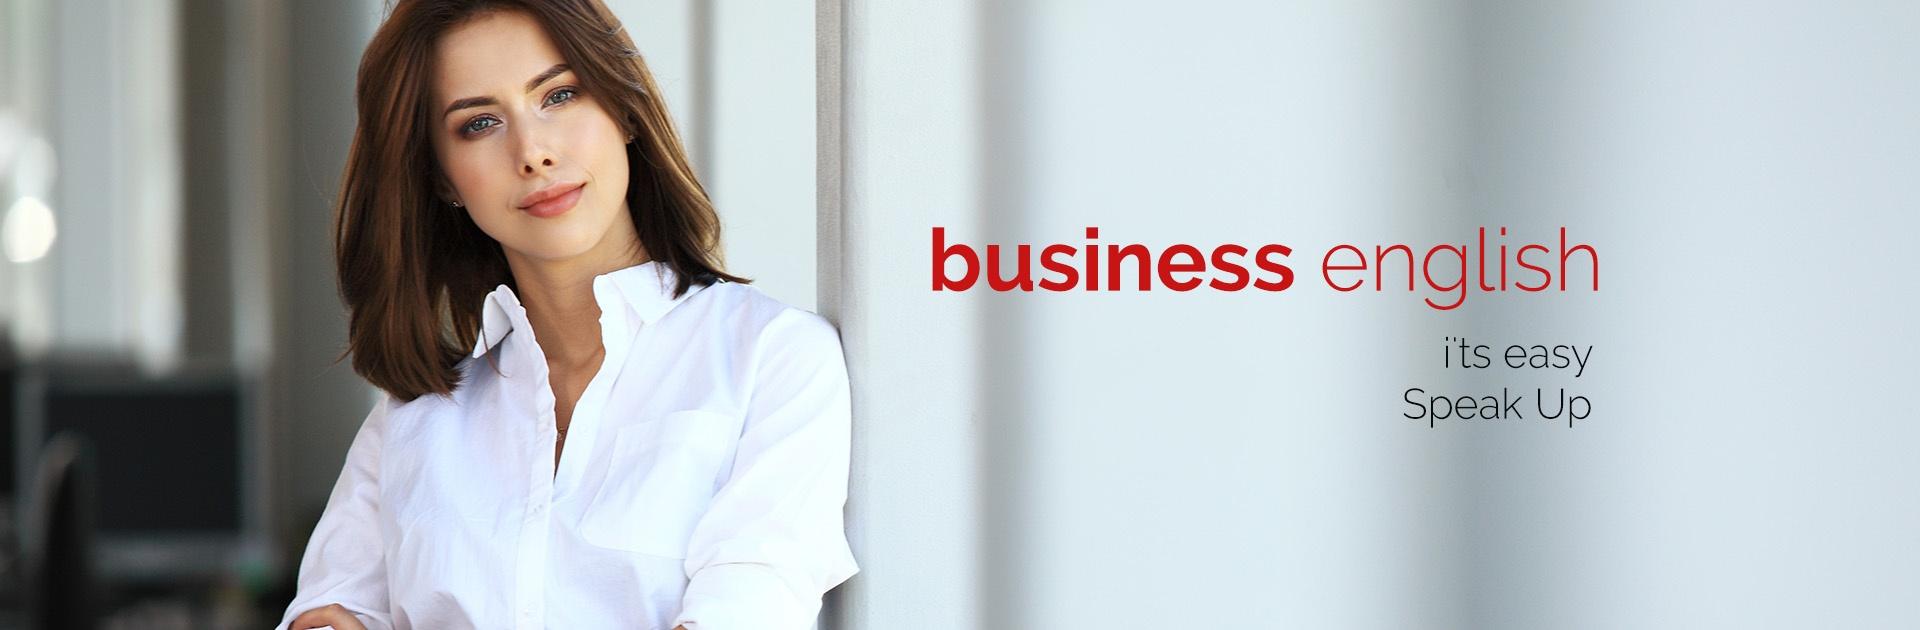 1920x630_baner_gora_business